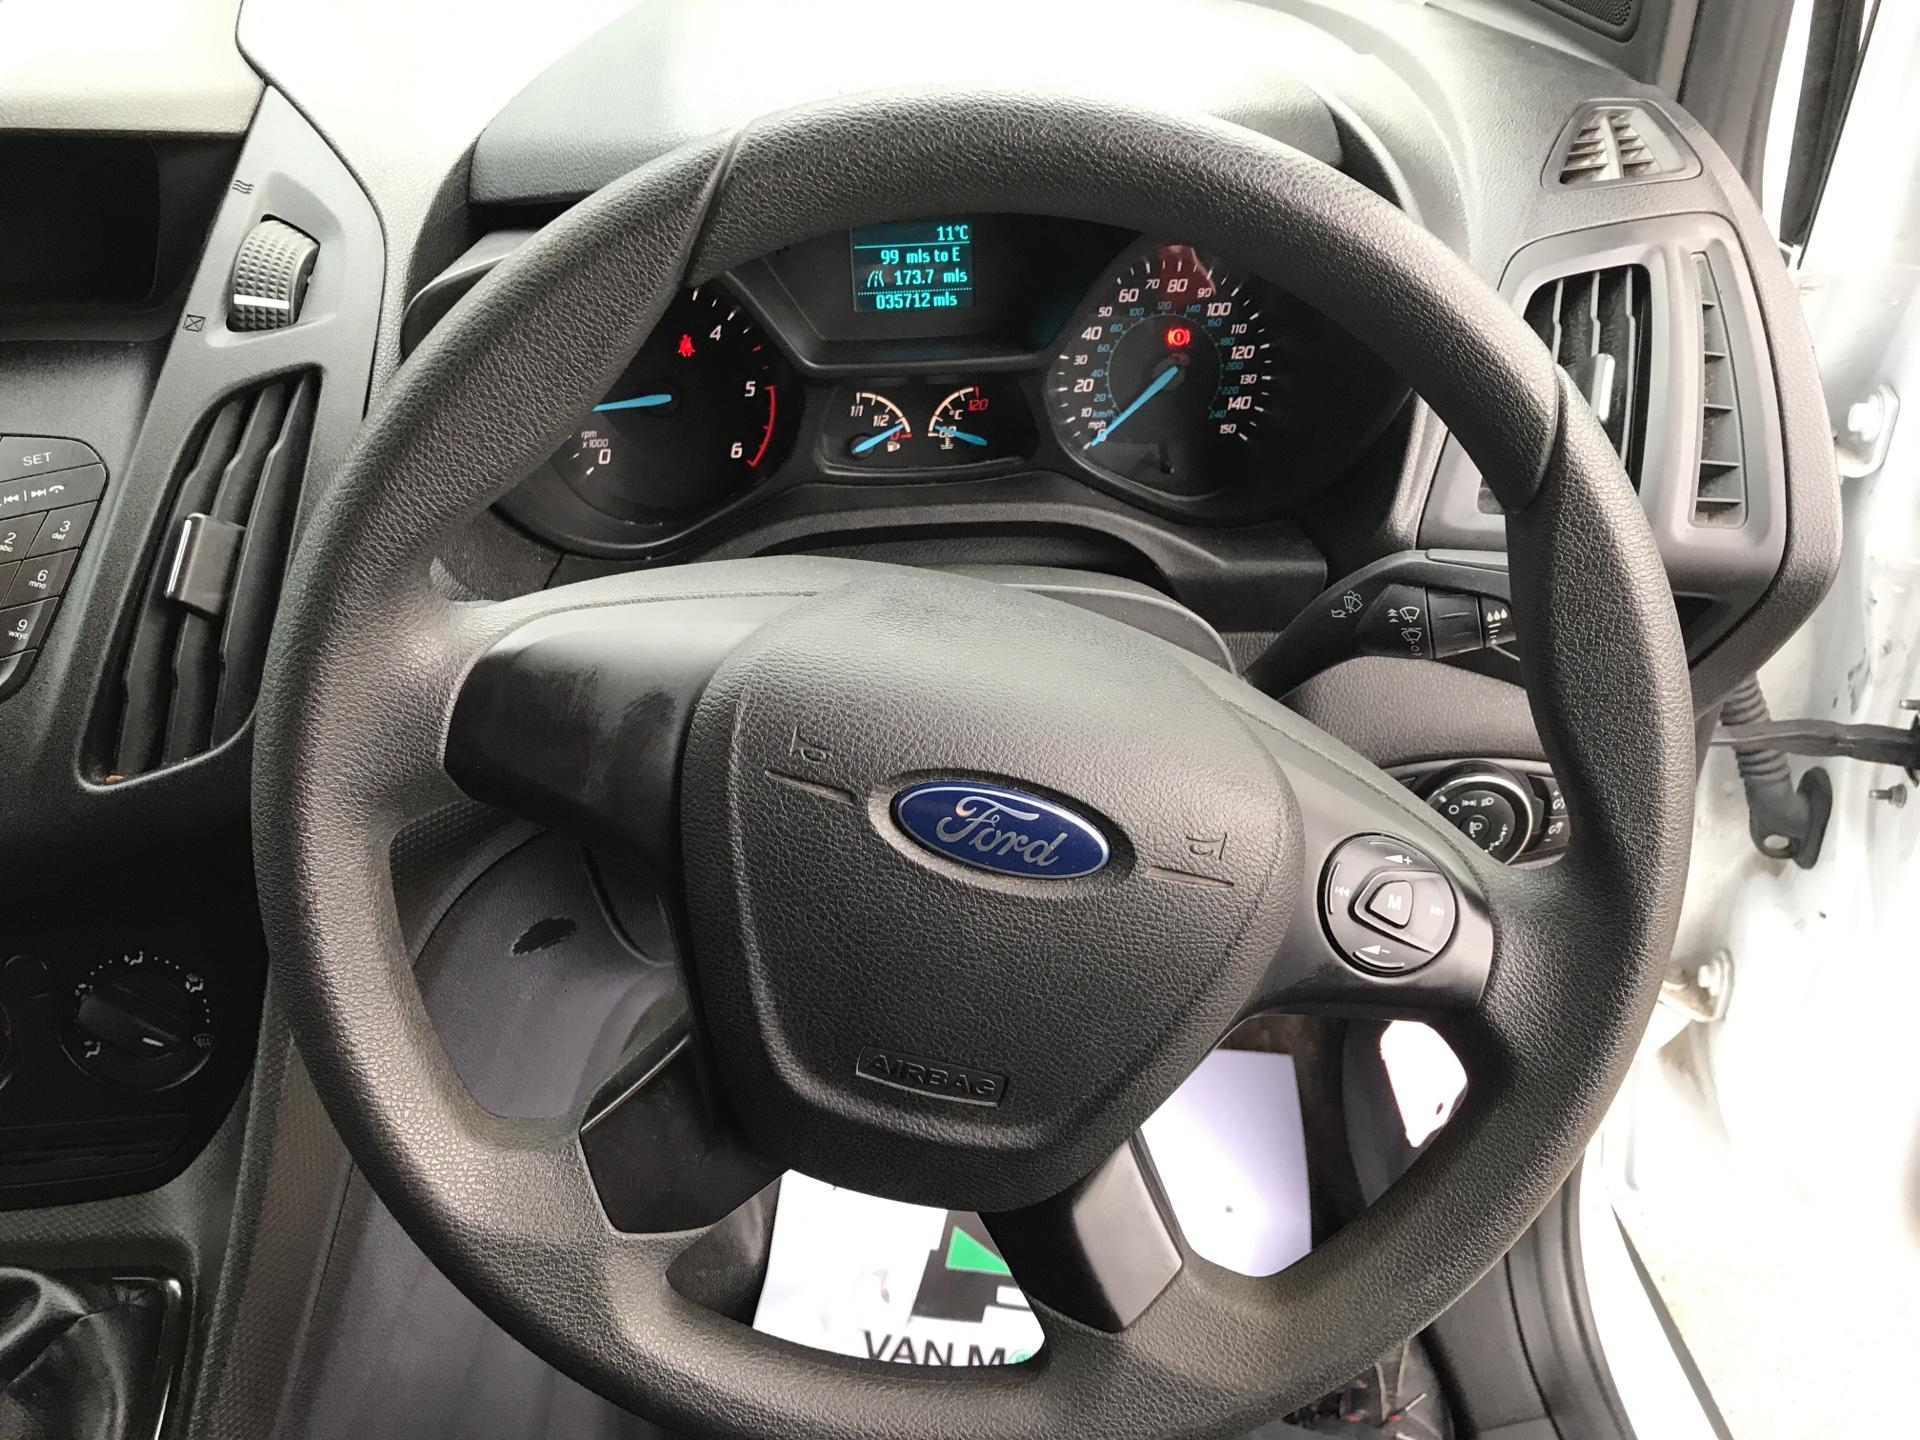 2016 Ford Transit Connect 200 L1 DIESEL 1.5 TDCI 75PS VAN EURO 6 (WU66XGE) Image 12